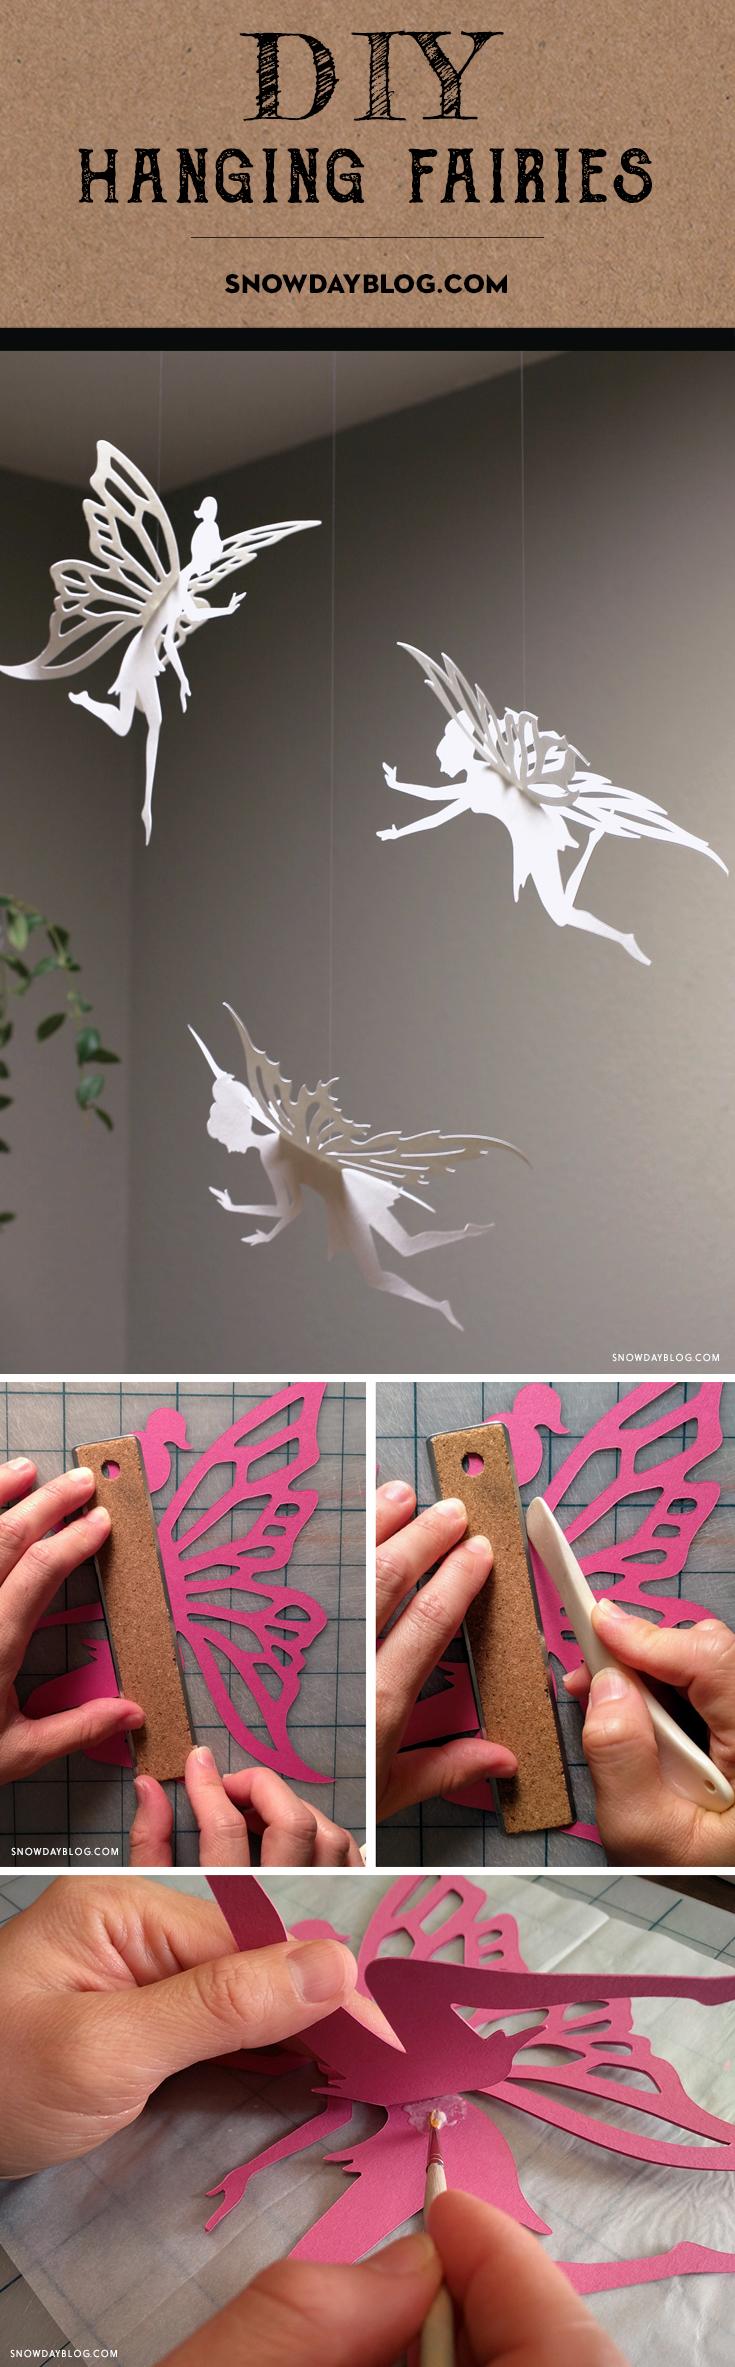 Hanging Fairies Pinterest White